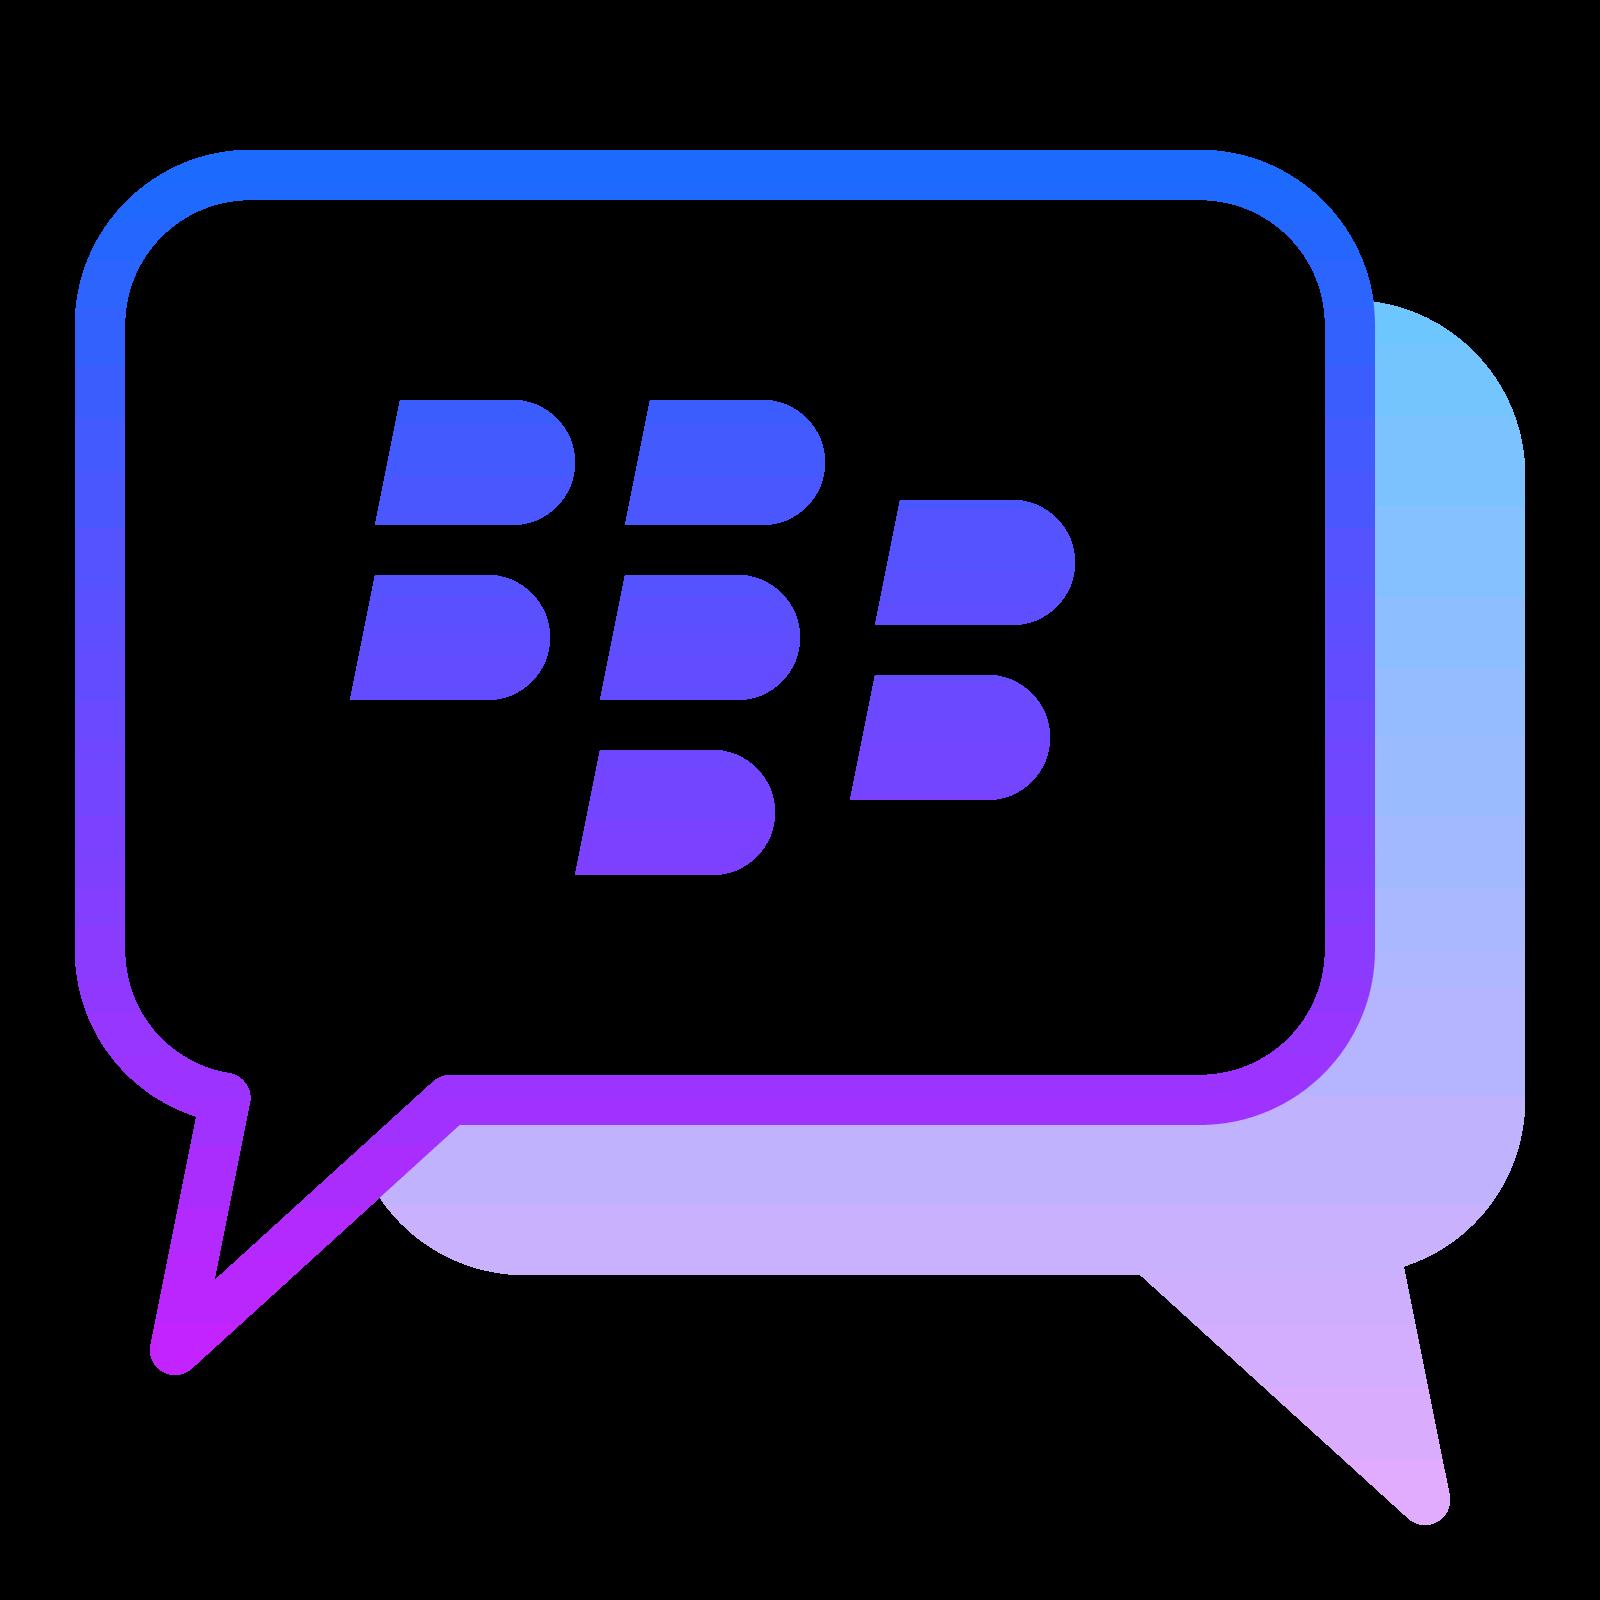 Logo bbm png 8 » PNG Image.